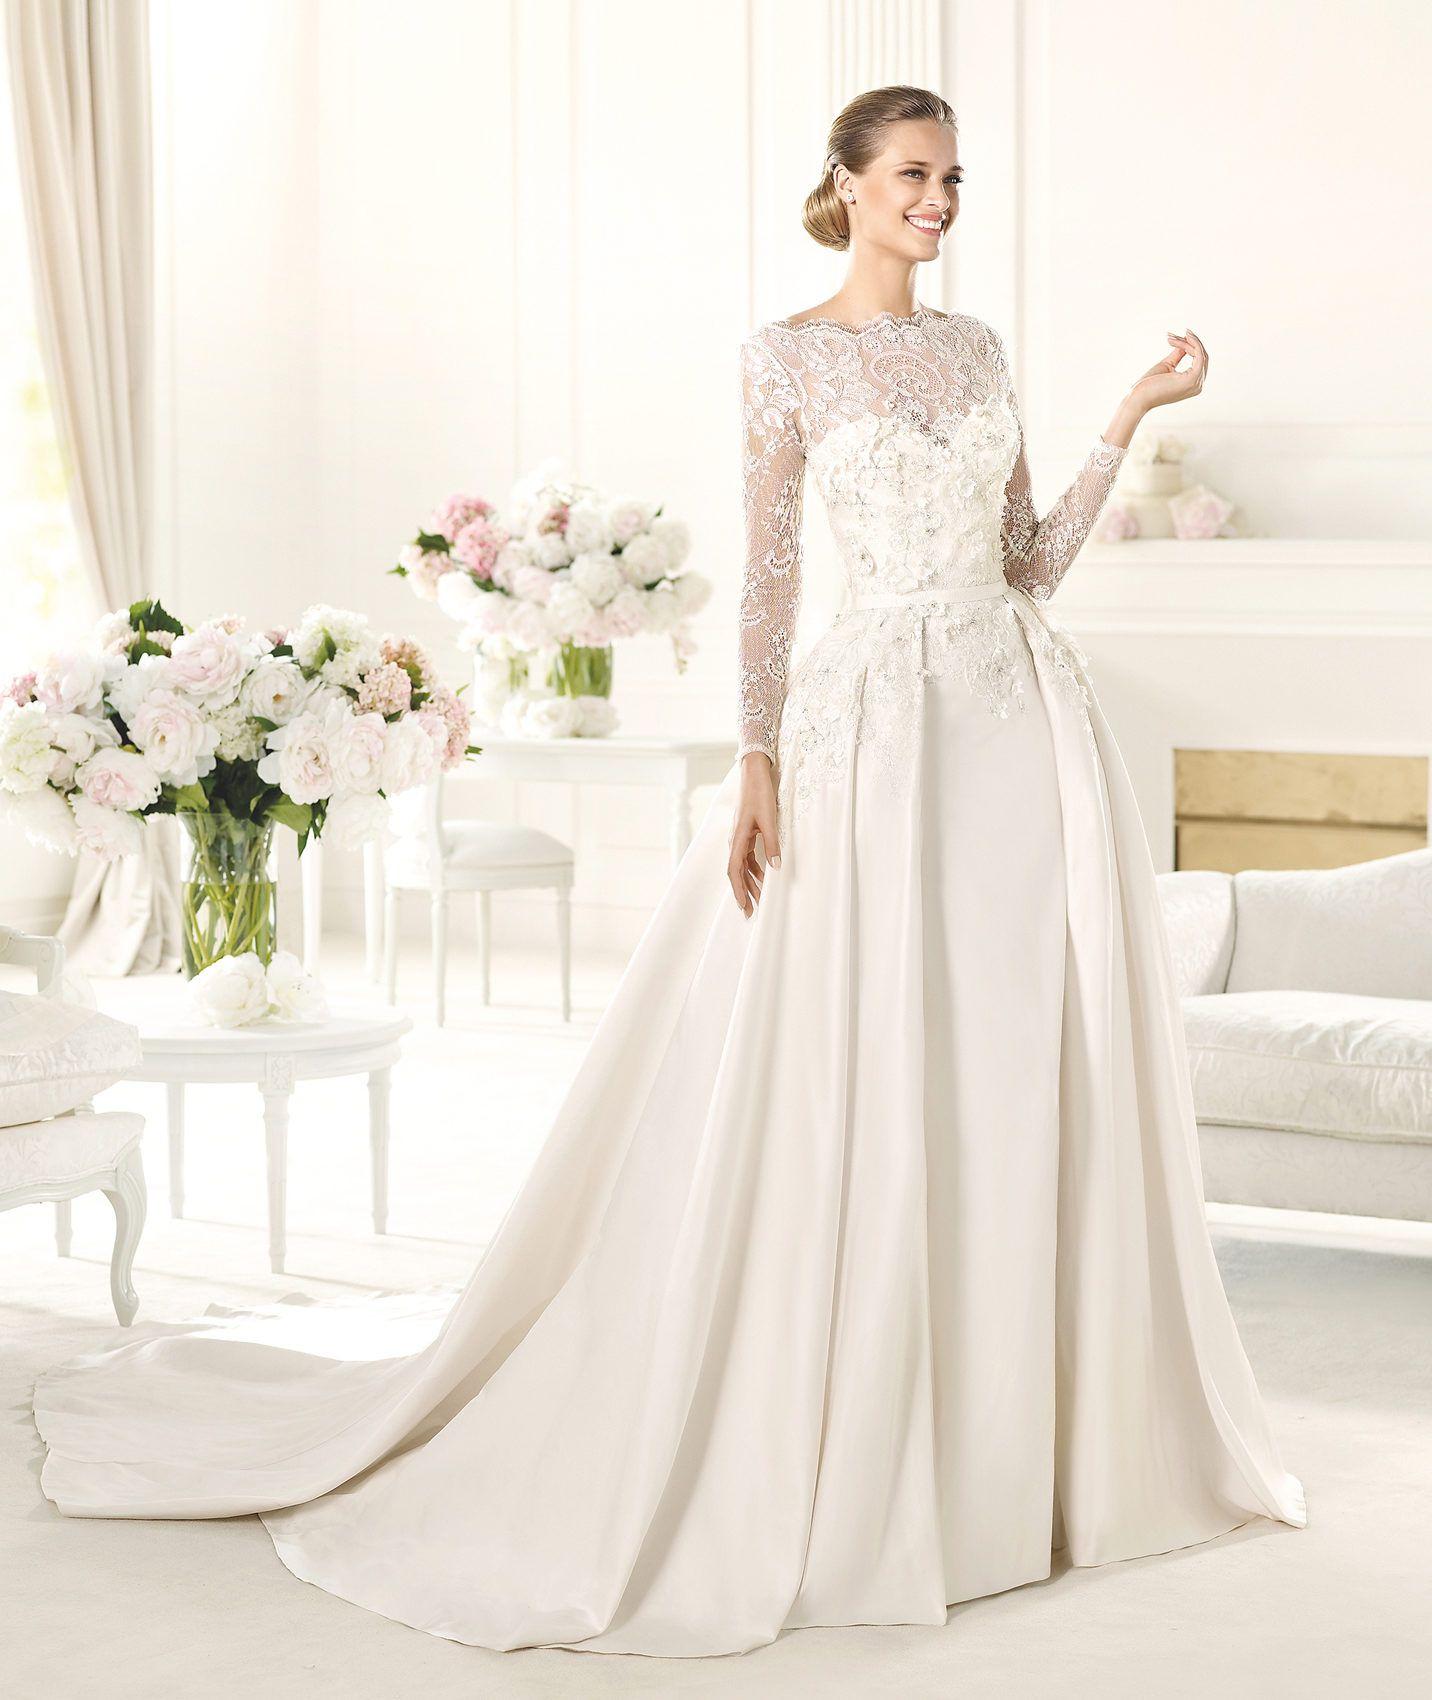 elie saab wedding dress Satin wedding dresses